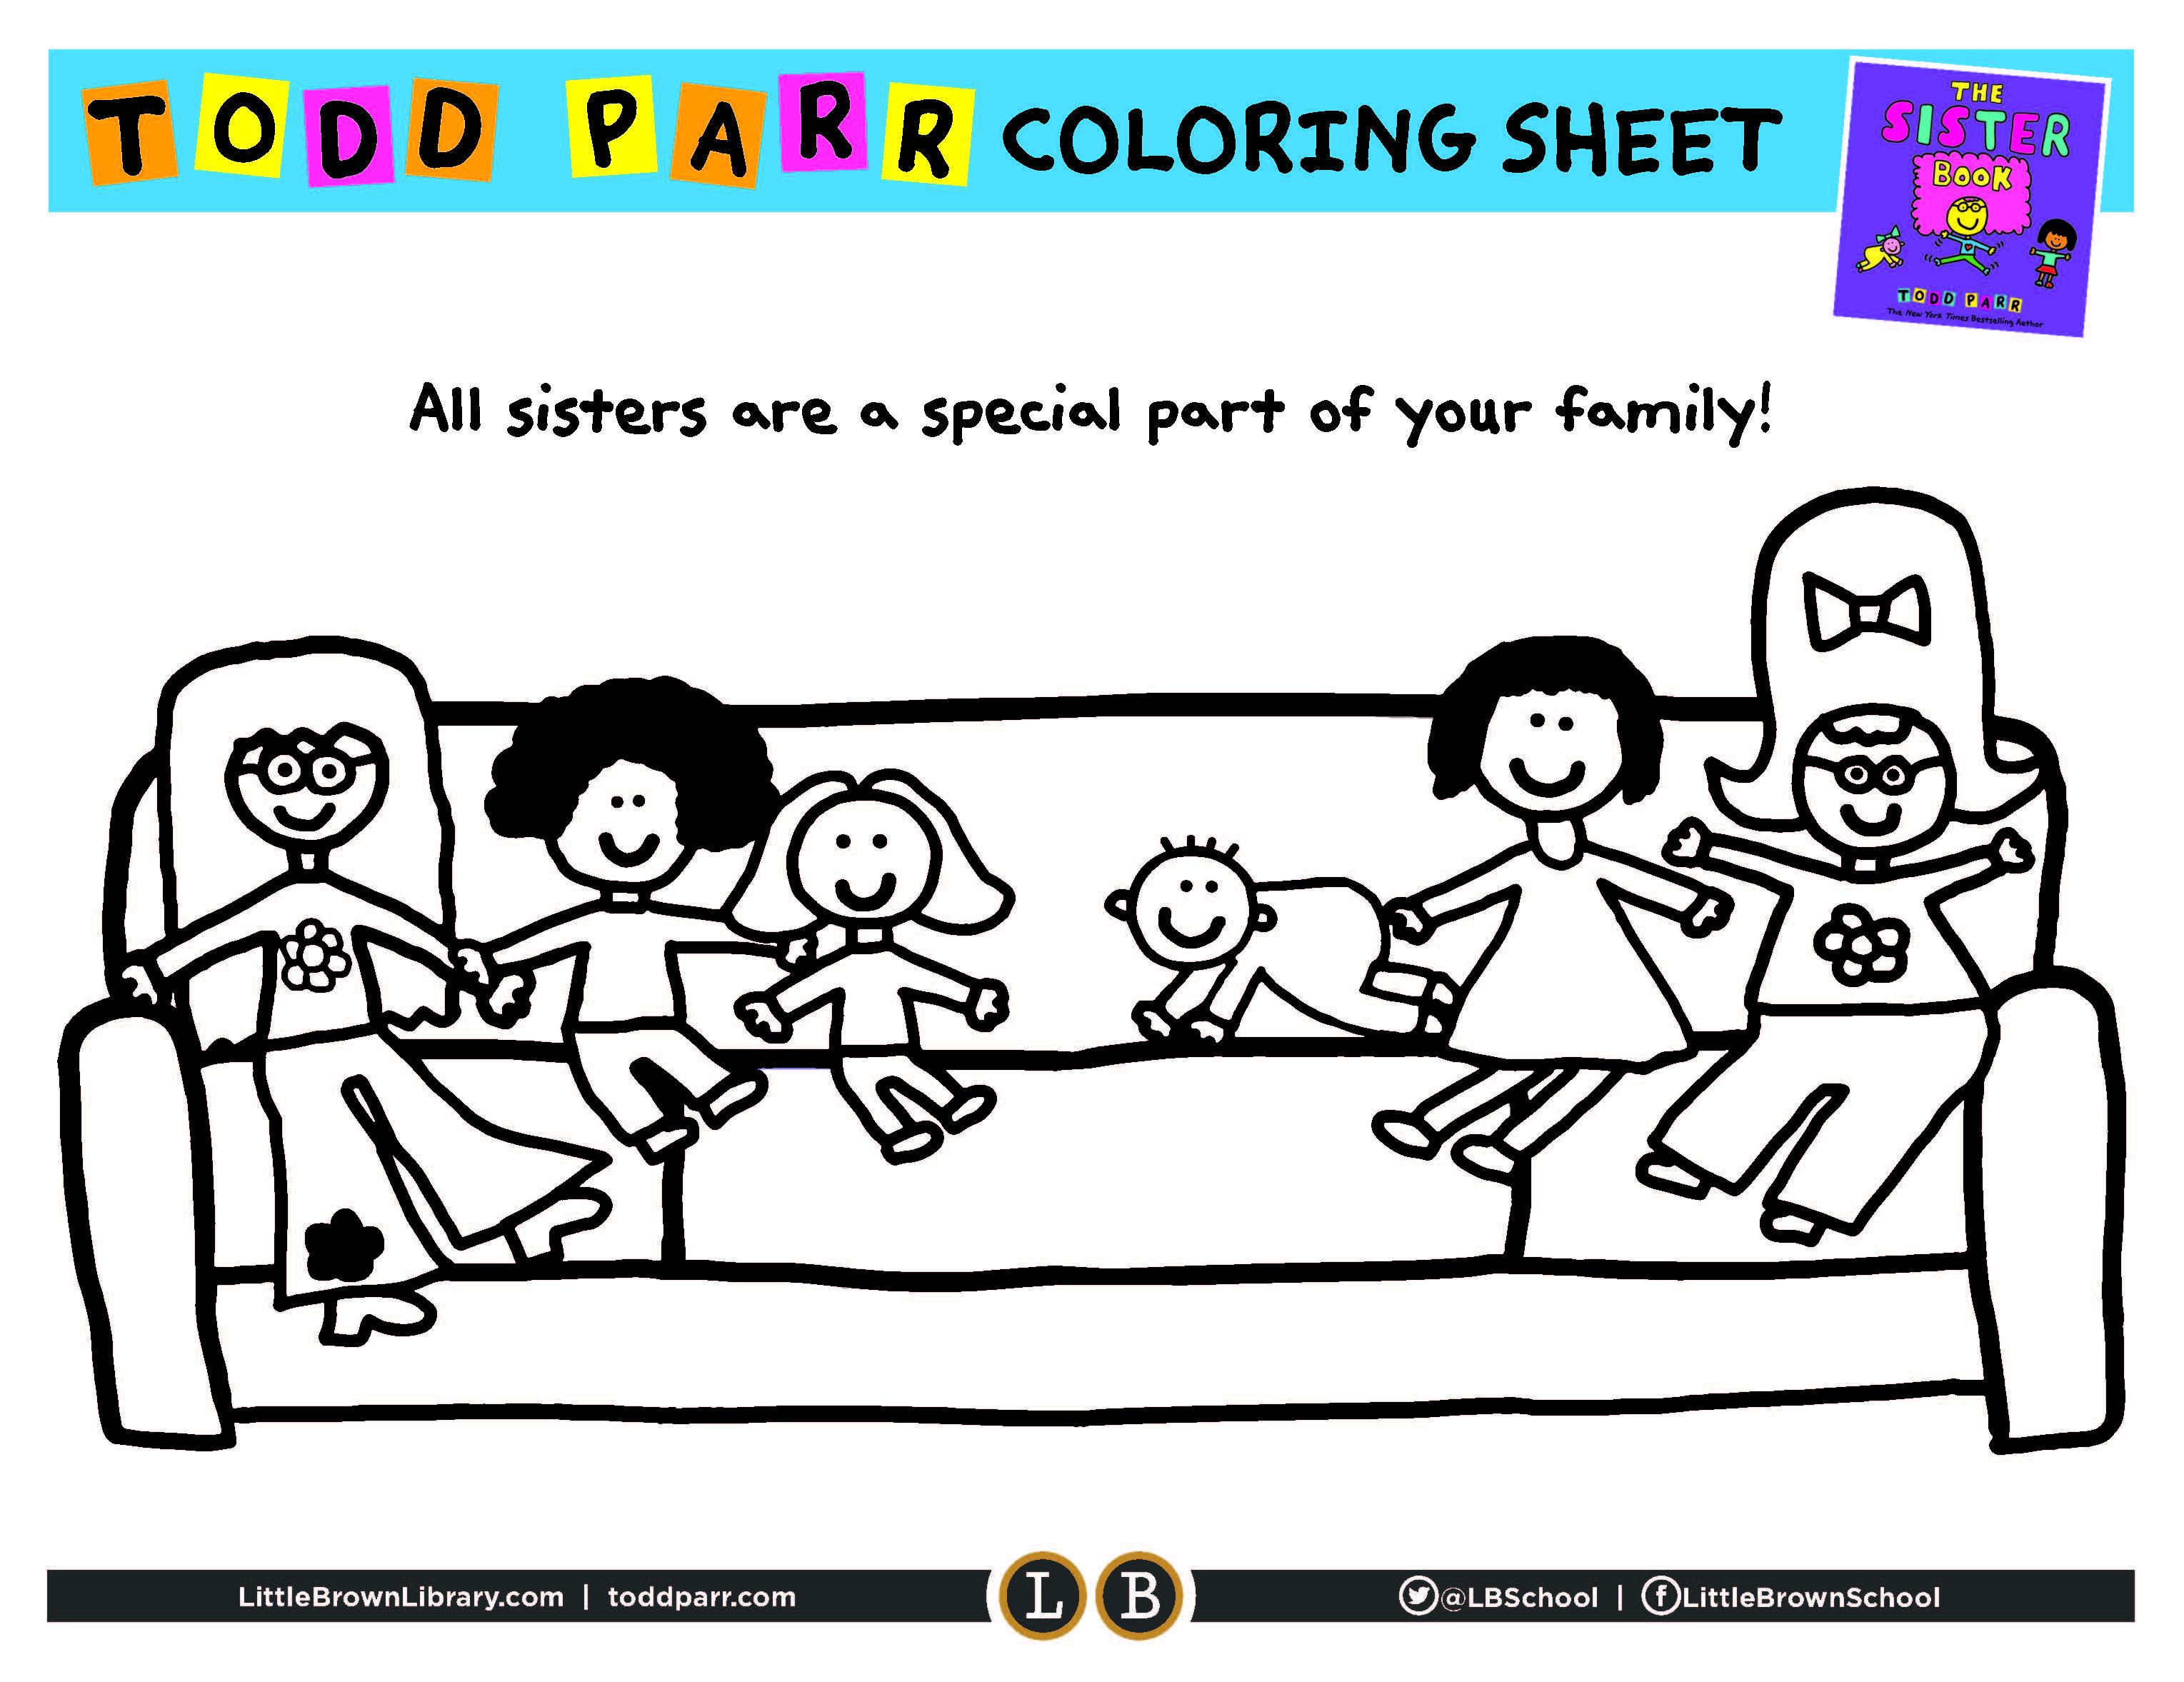 Todd Parr Children S Book Author And Illustrator